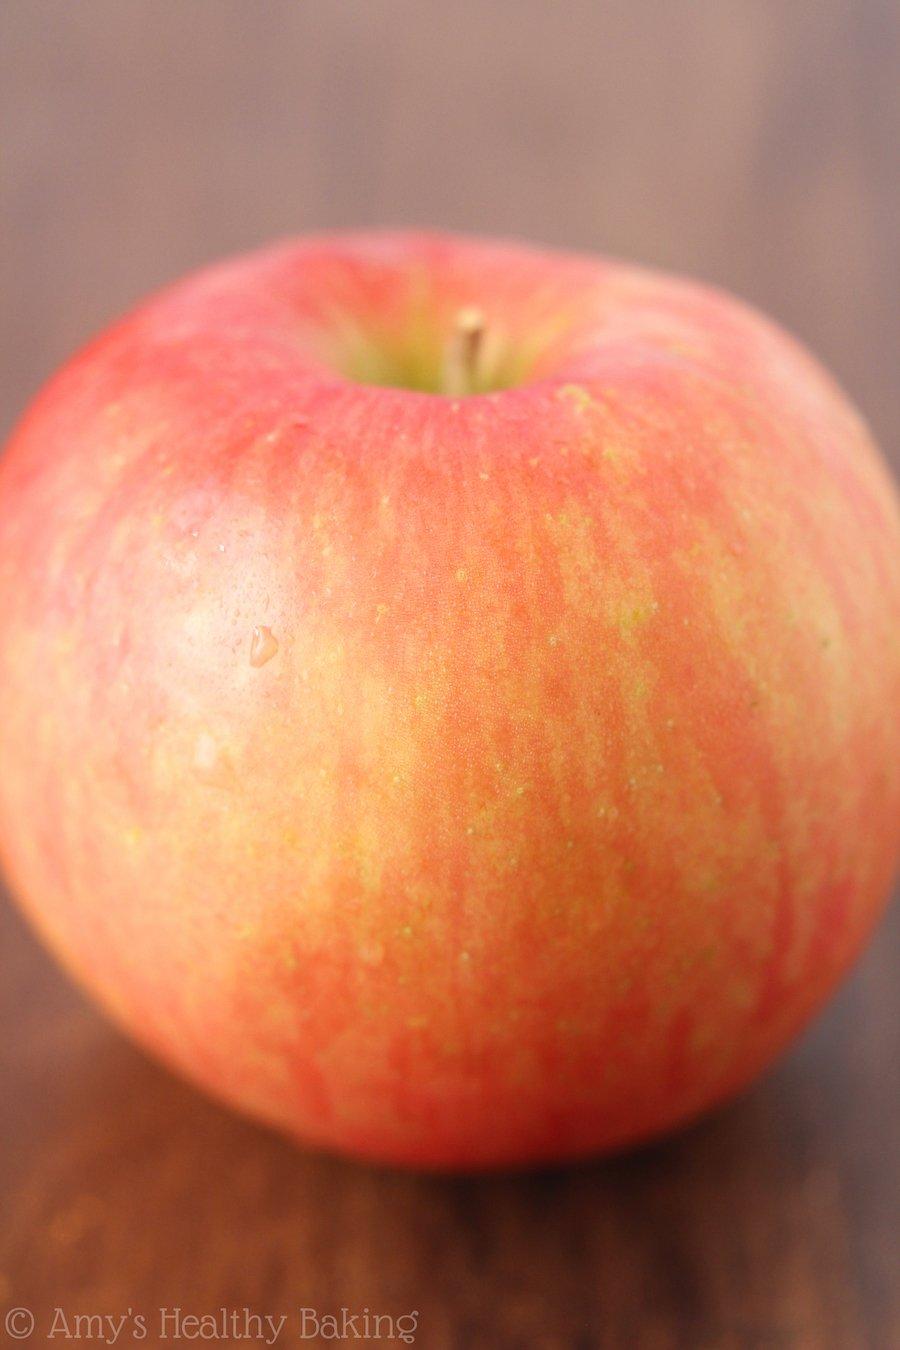 Fuji apple for Apple Pie Oatmeal Cookies